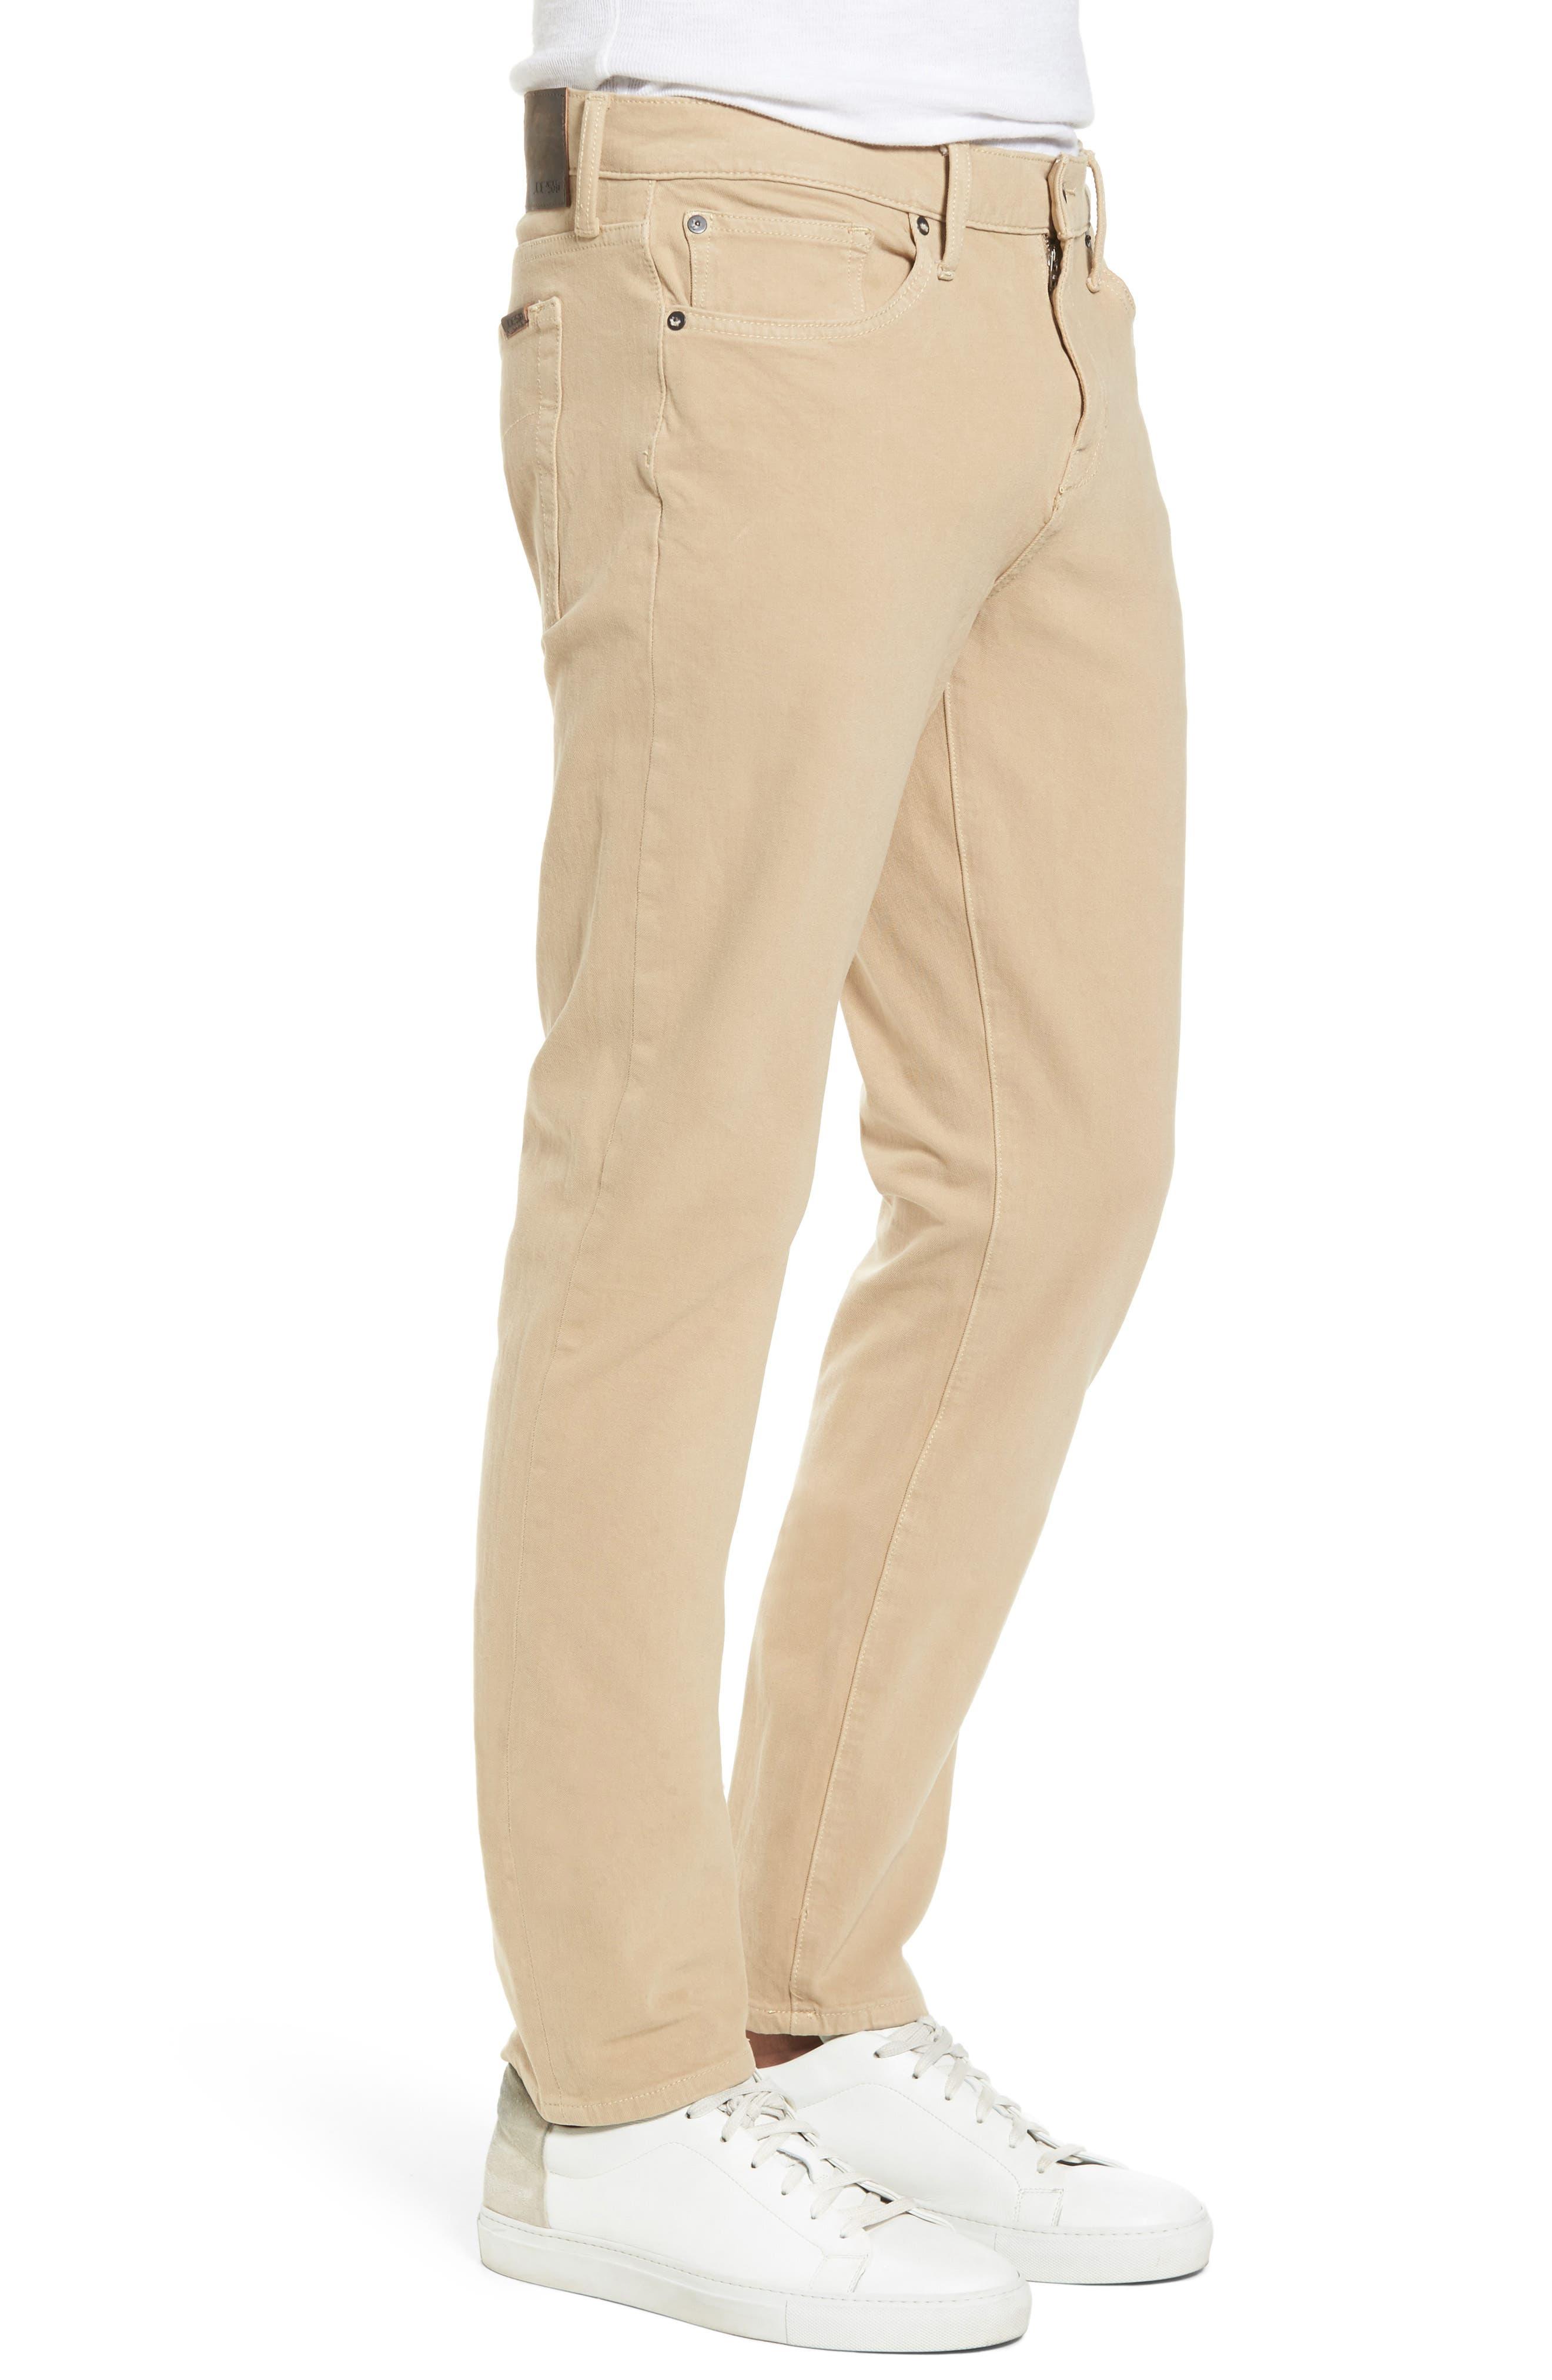 JOE'S,                             Kinetic Slim Fit Jeans,                             Alternate thumbnail 3, color,                             SAND